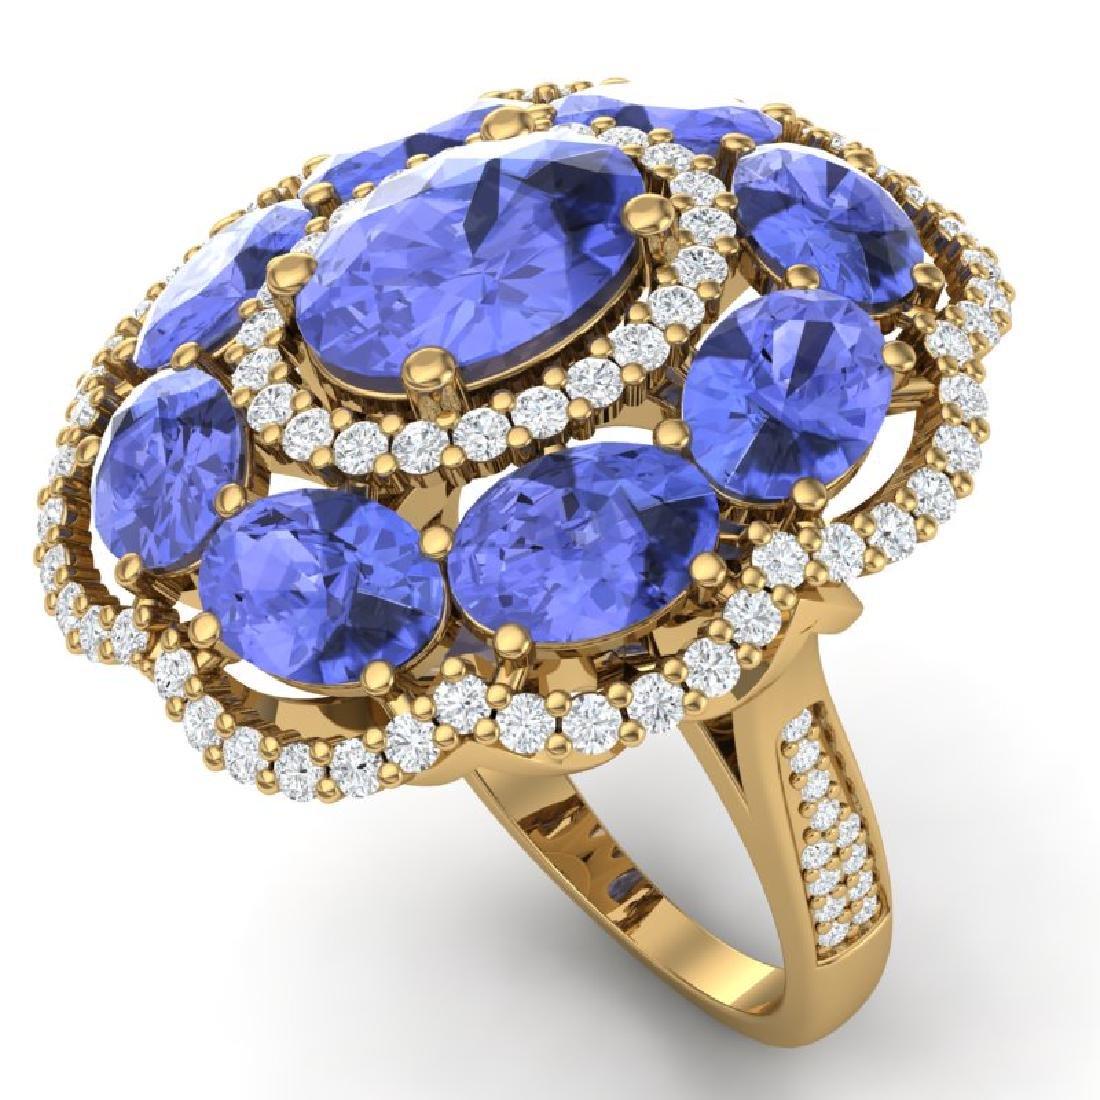 15.24 CTW Royalty Tanzanite & VS Diamond Ring 18K